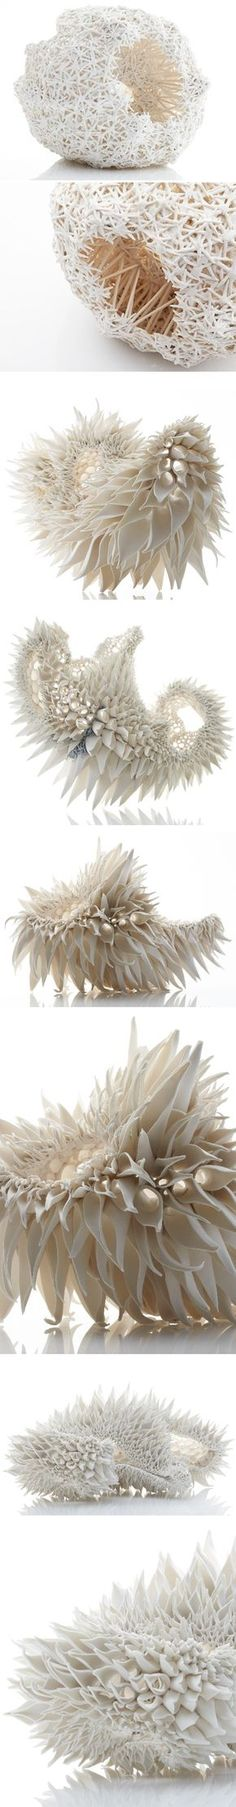 Organic ceramic pieces by Nuala O'Donovan